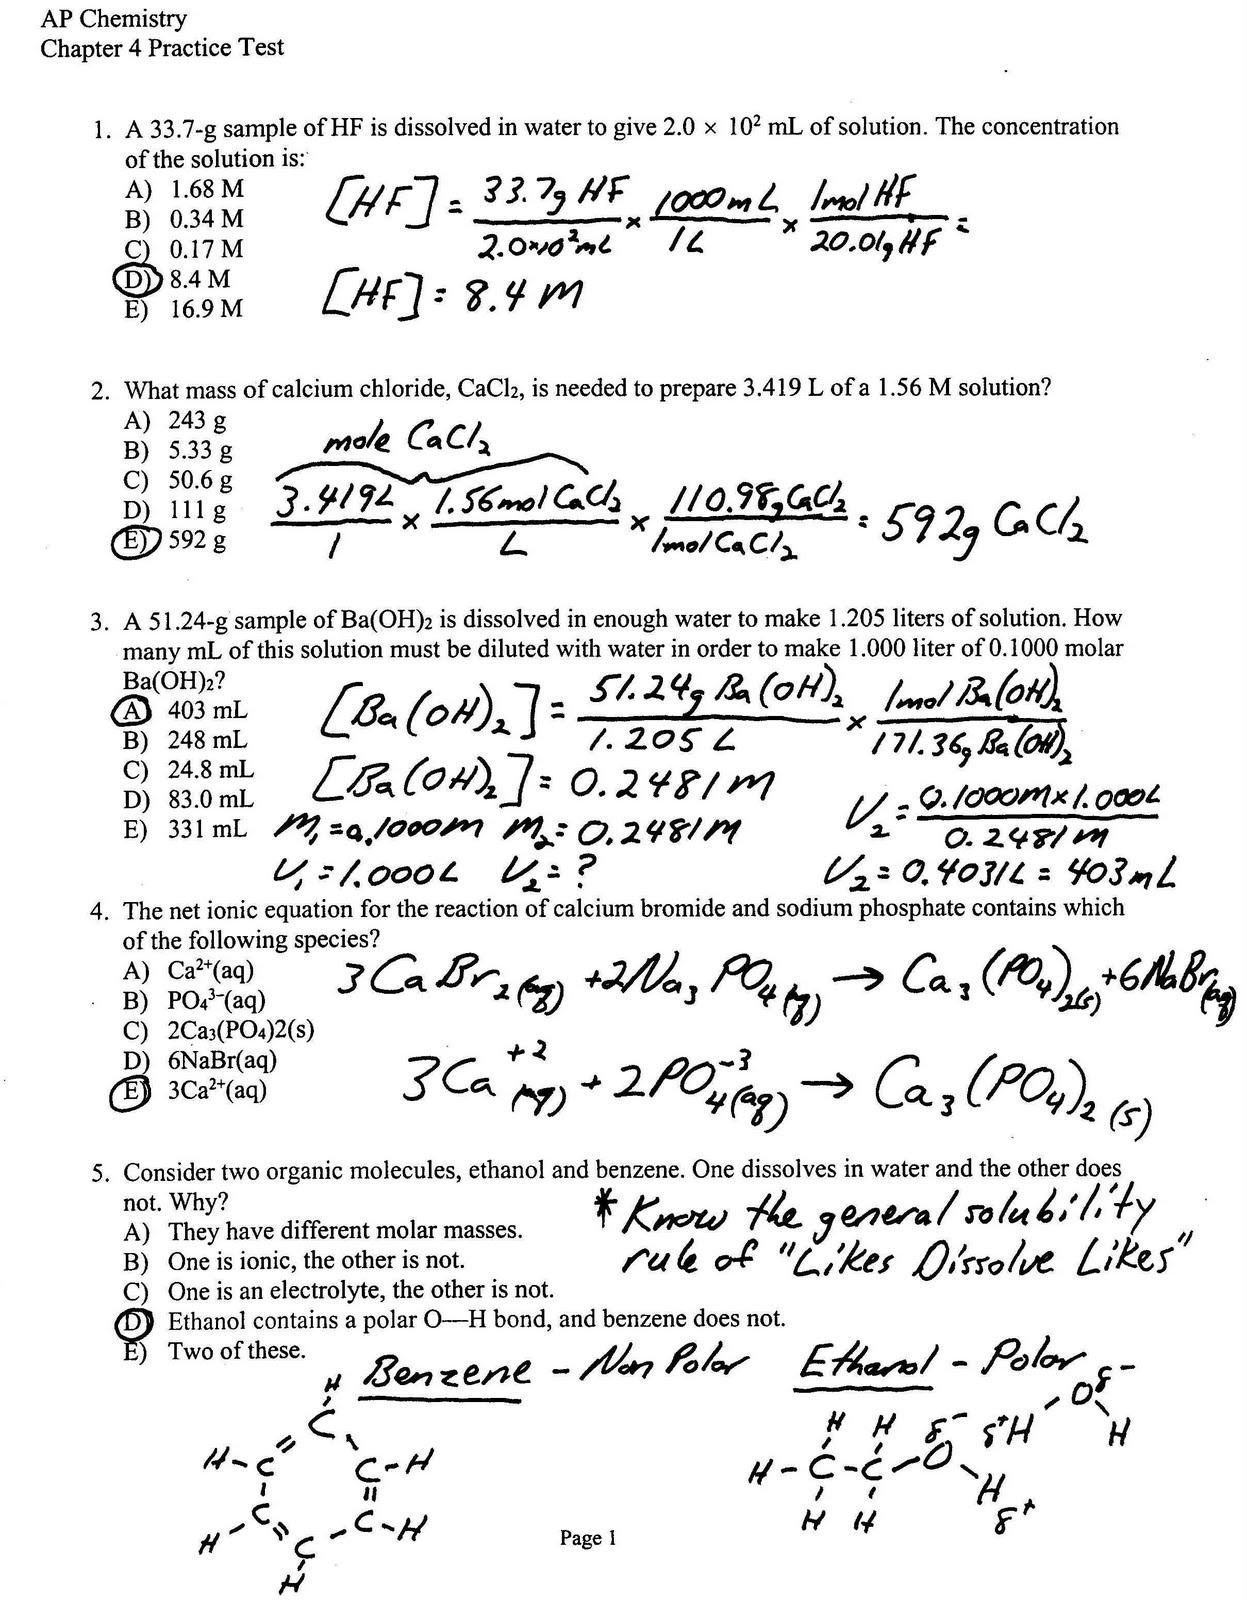 Heritage High School - Mr. Brueckner's AP Chemistry Class ...